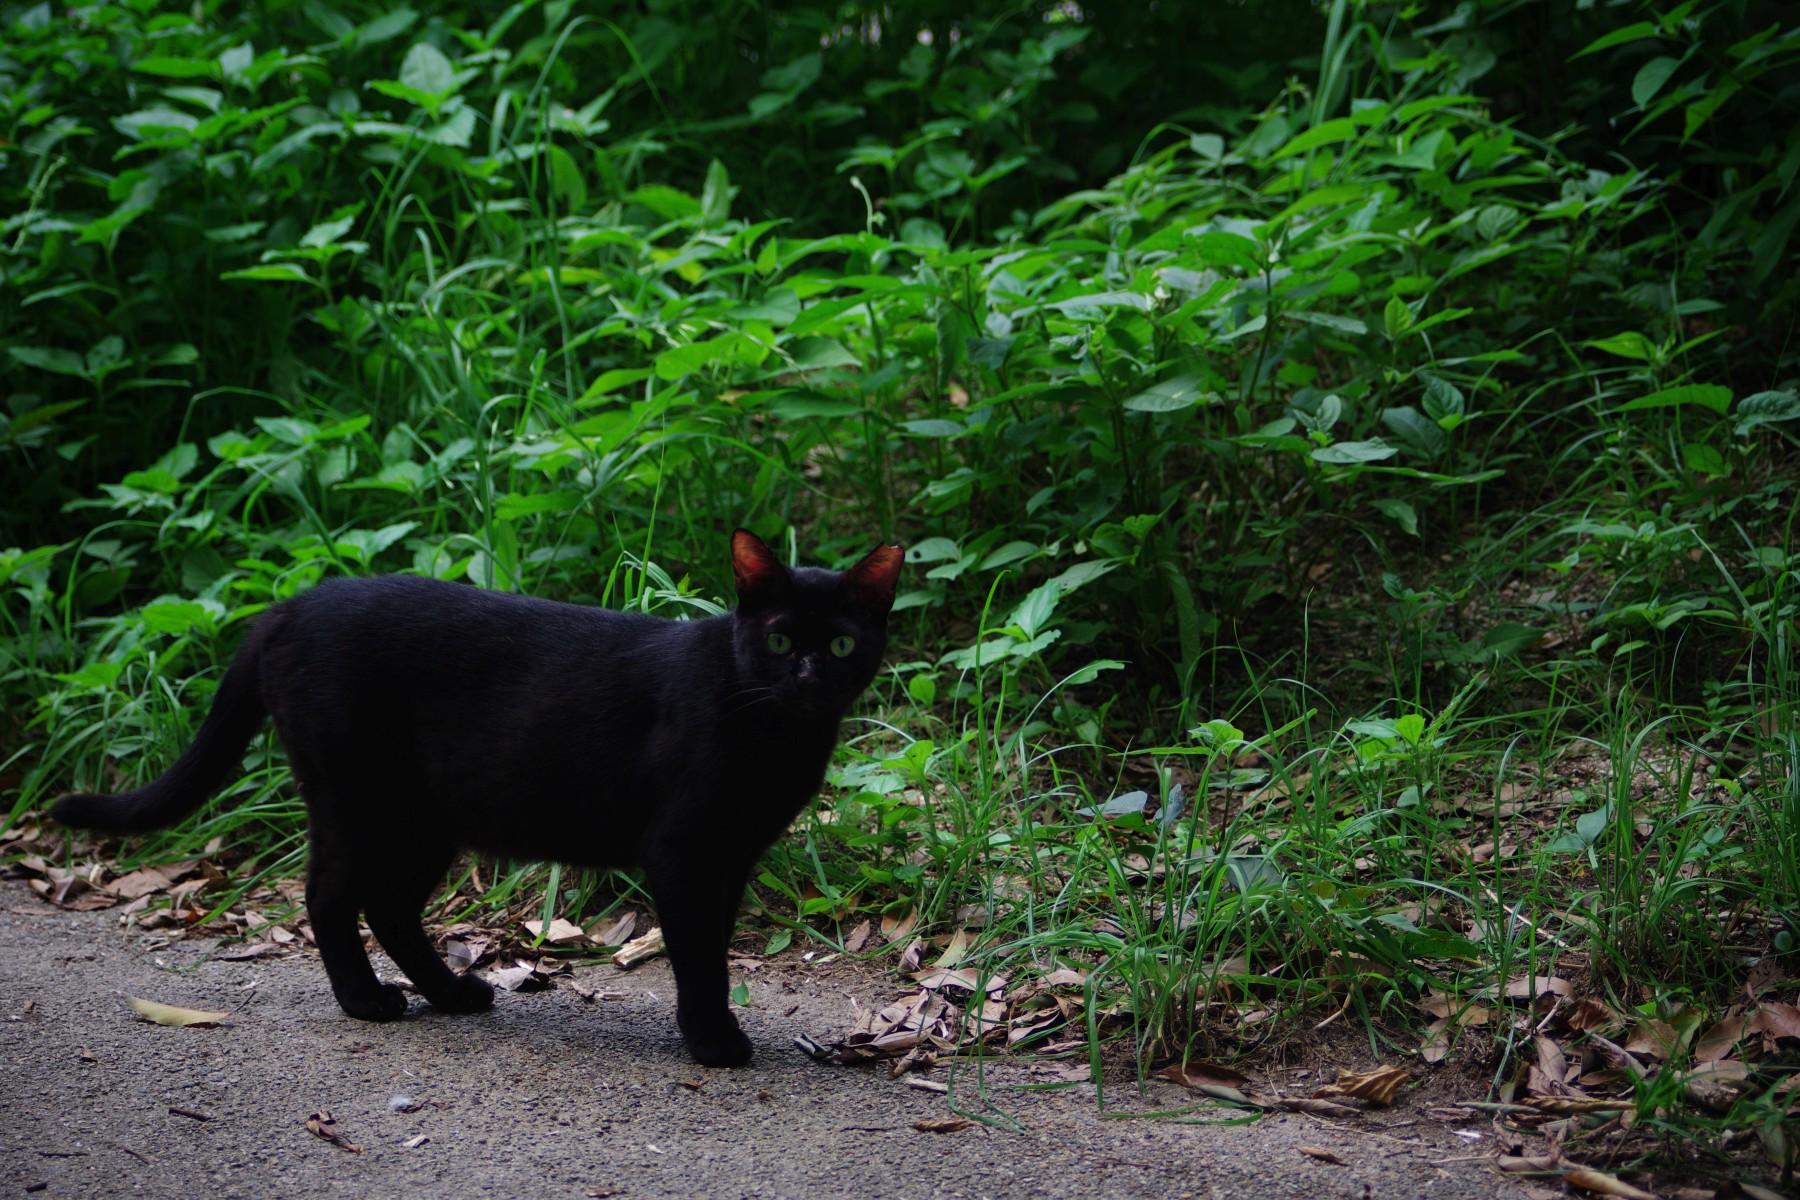 黒猫 – Black cat